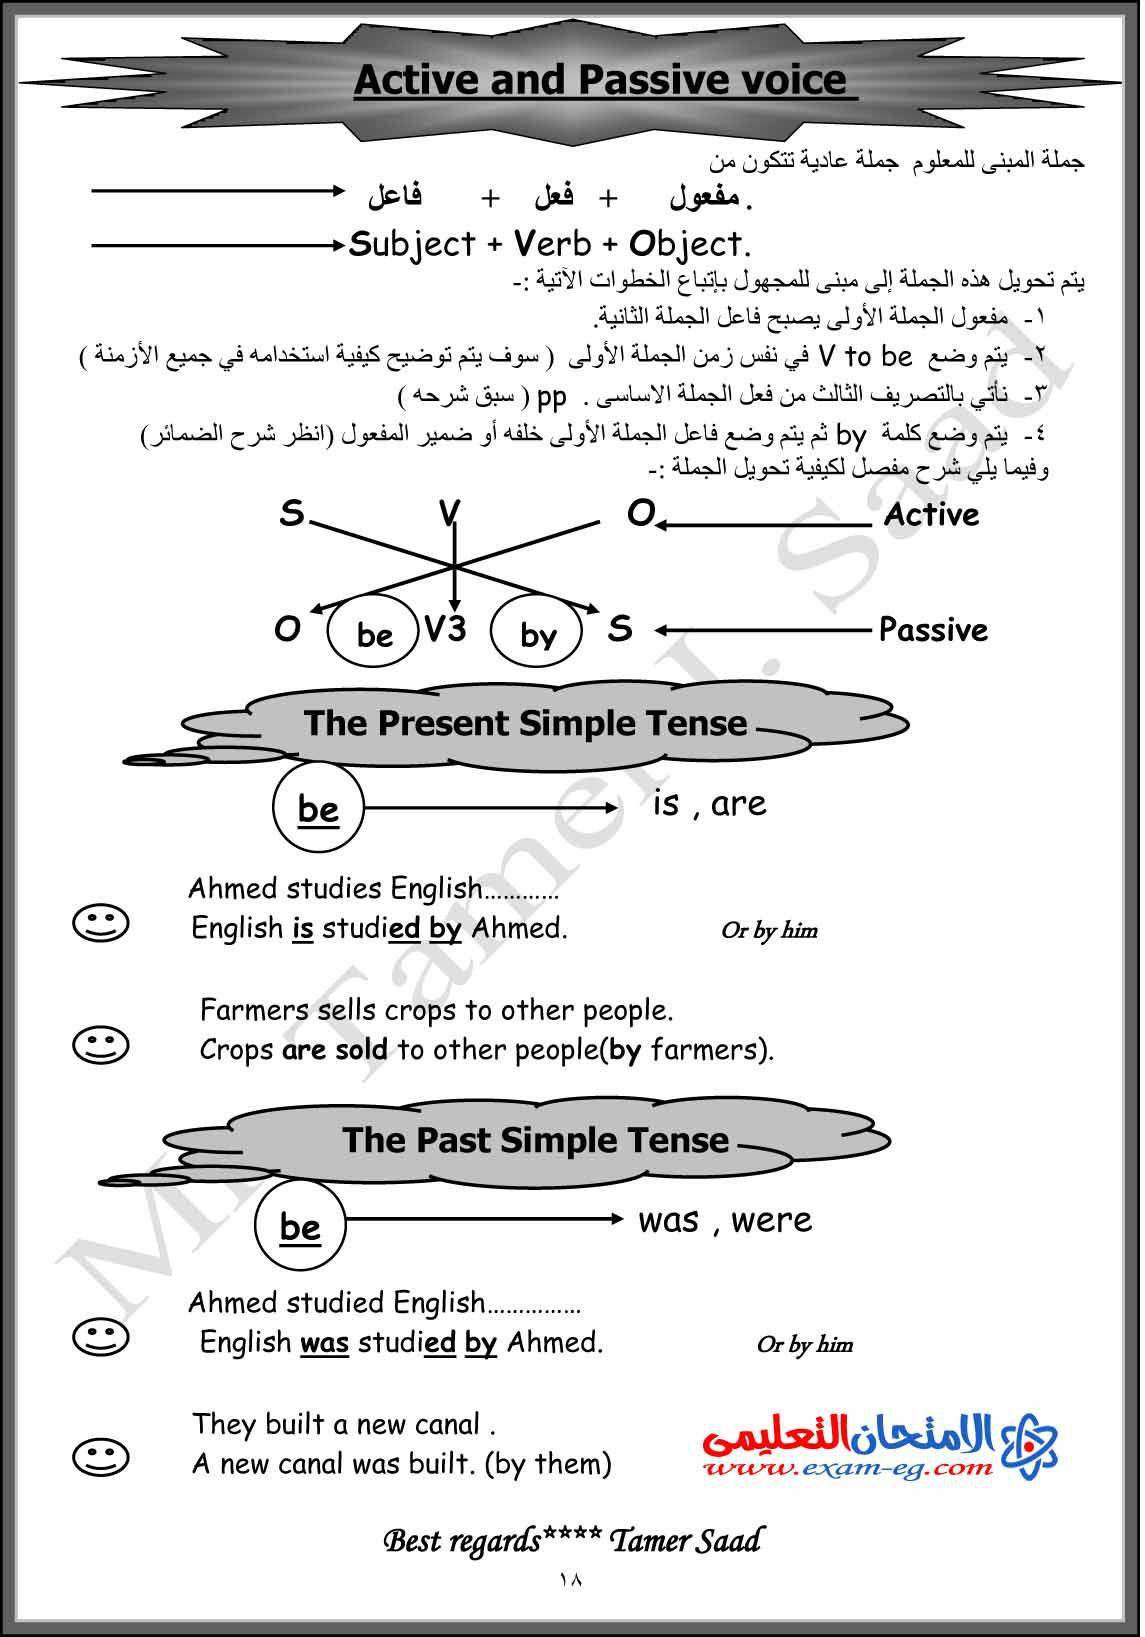 exam-eg.com_14428452406718.jpg